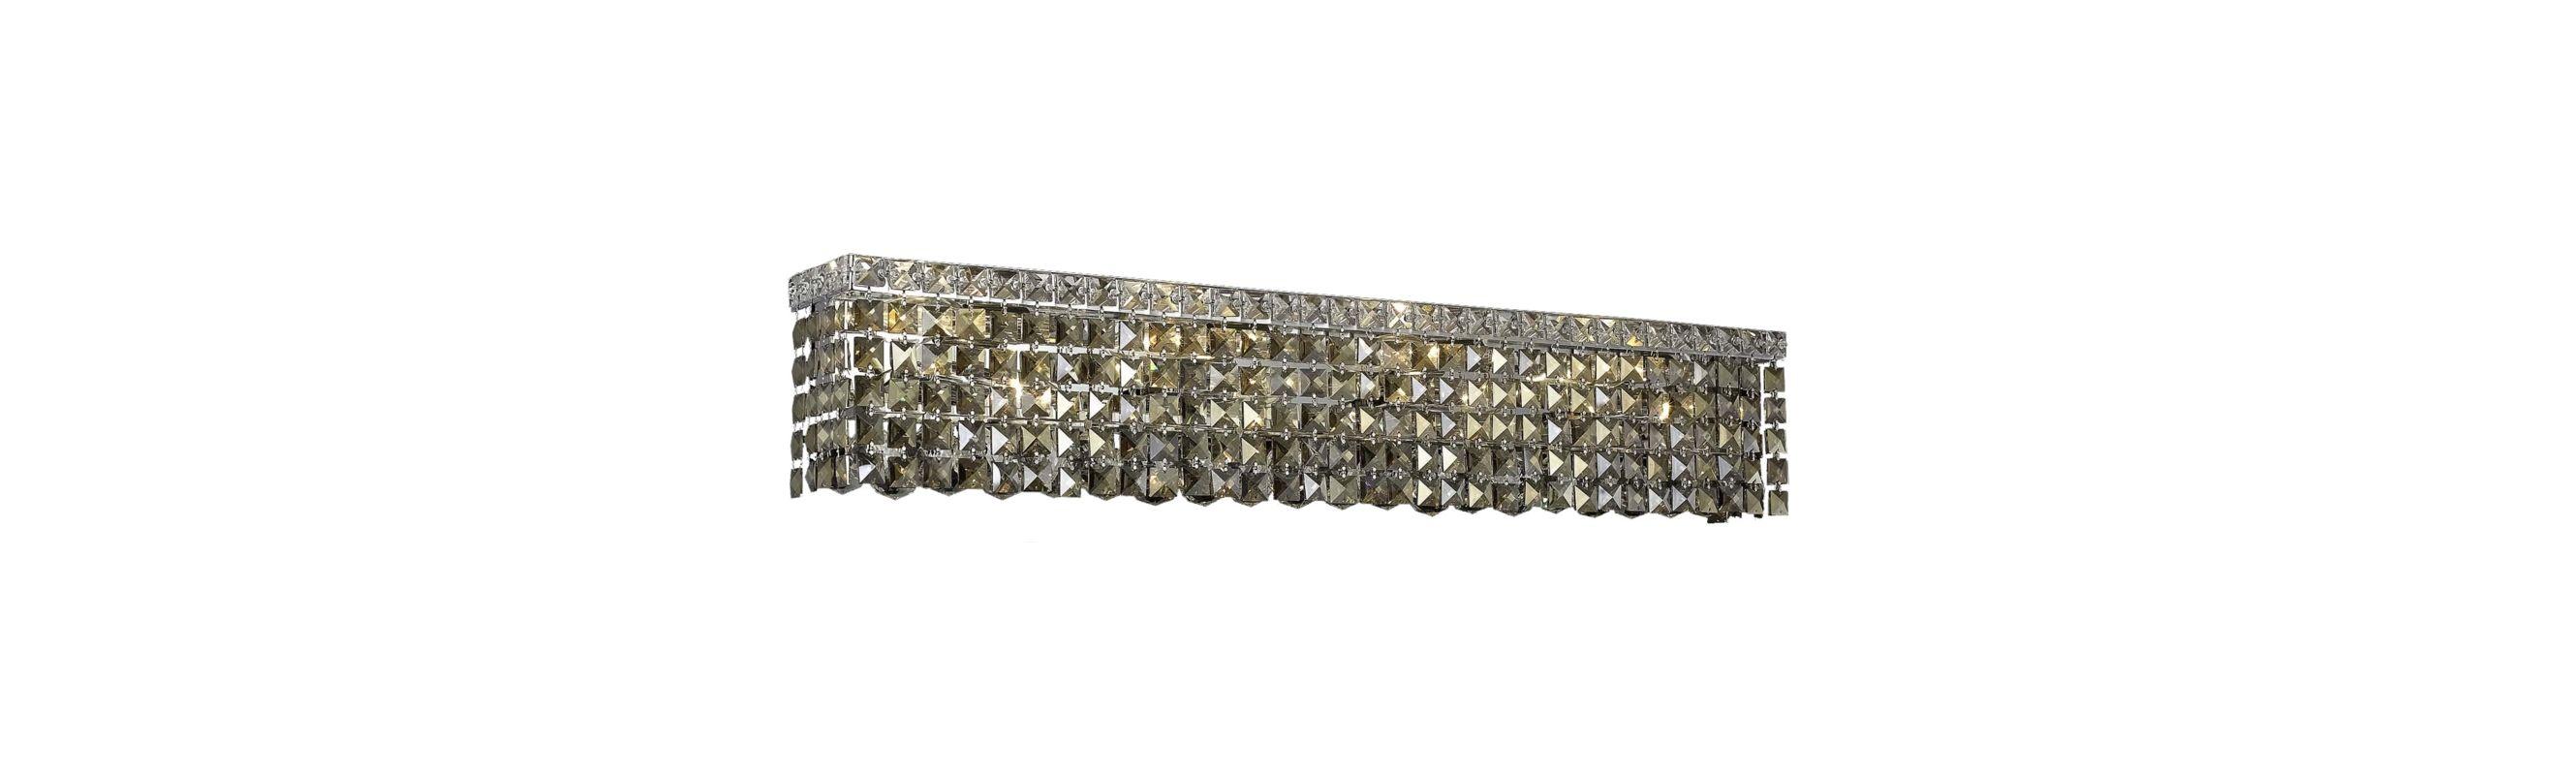 Elegant Lighting 2033W36C-GT Maxim 8-Light Crystal Wall Sconce